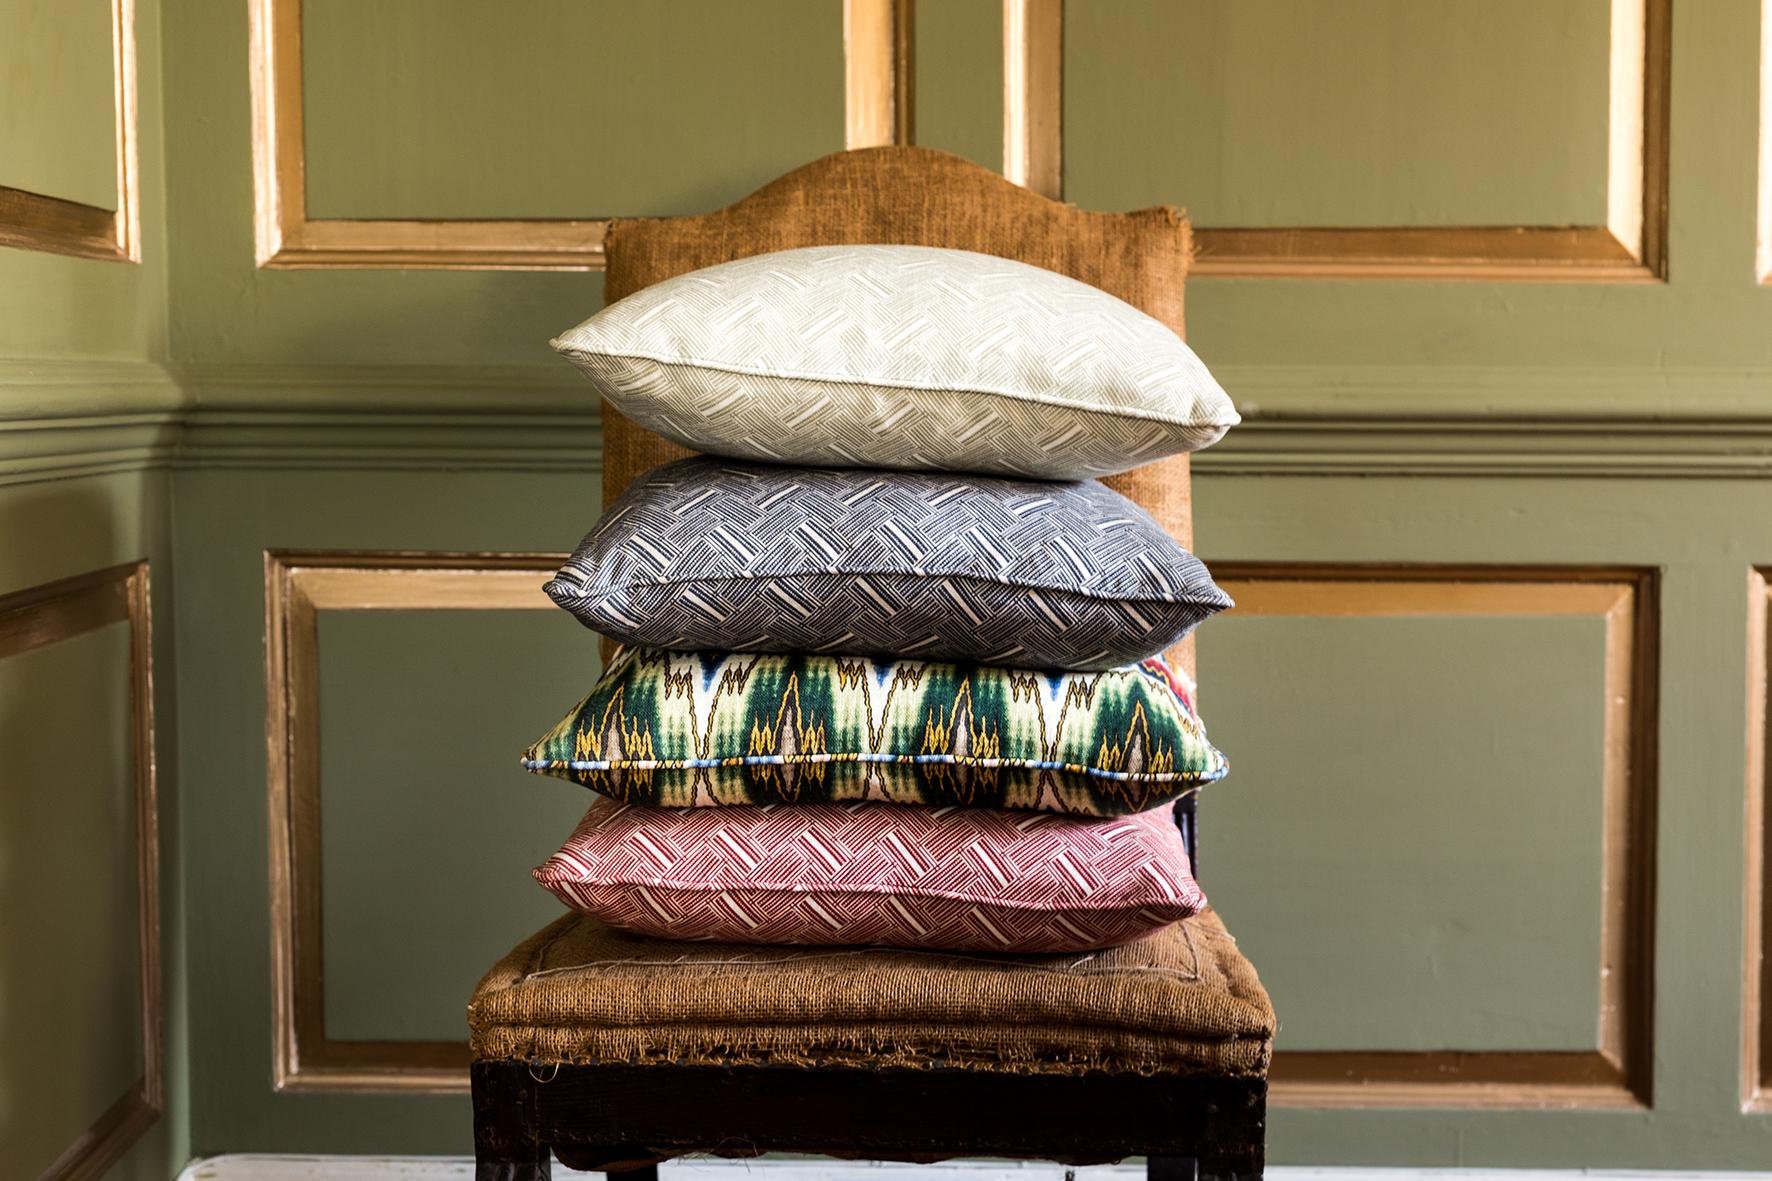 TeyssierDec17-57 cushions on chair.jpg